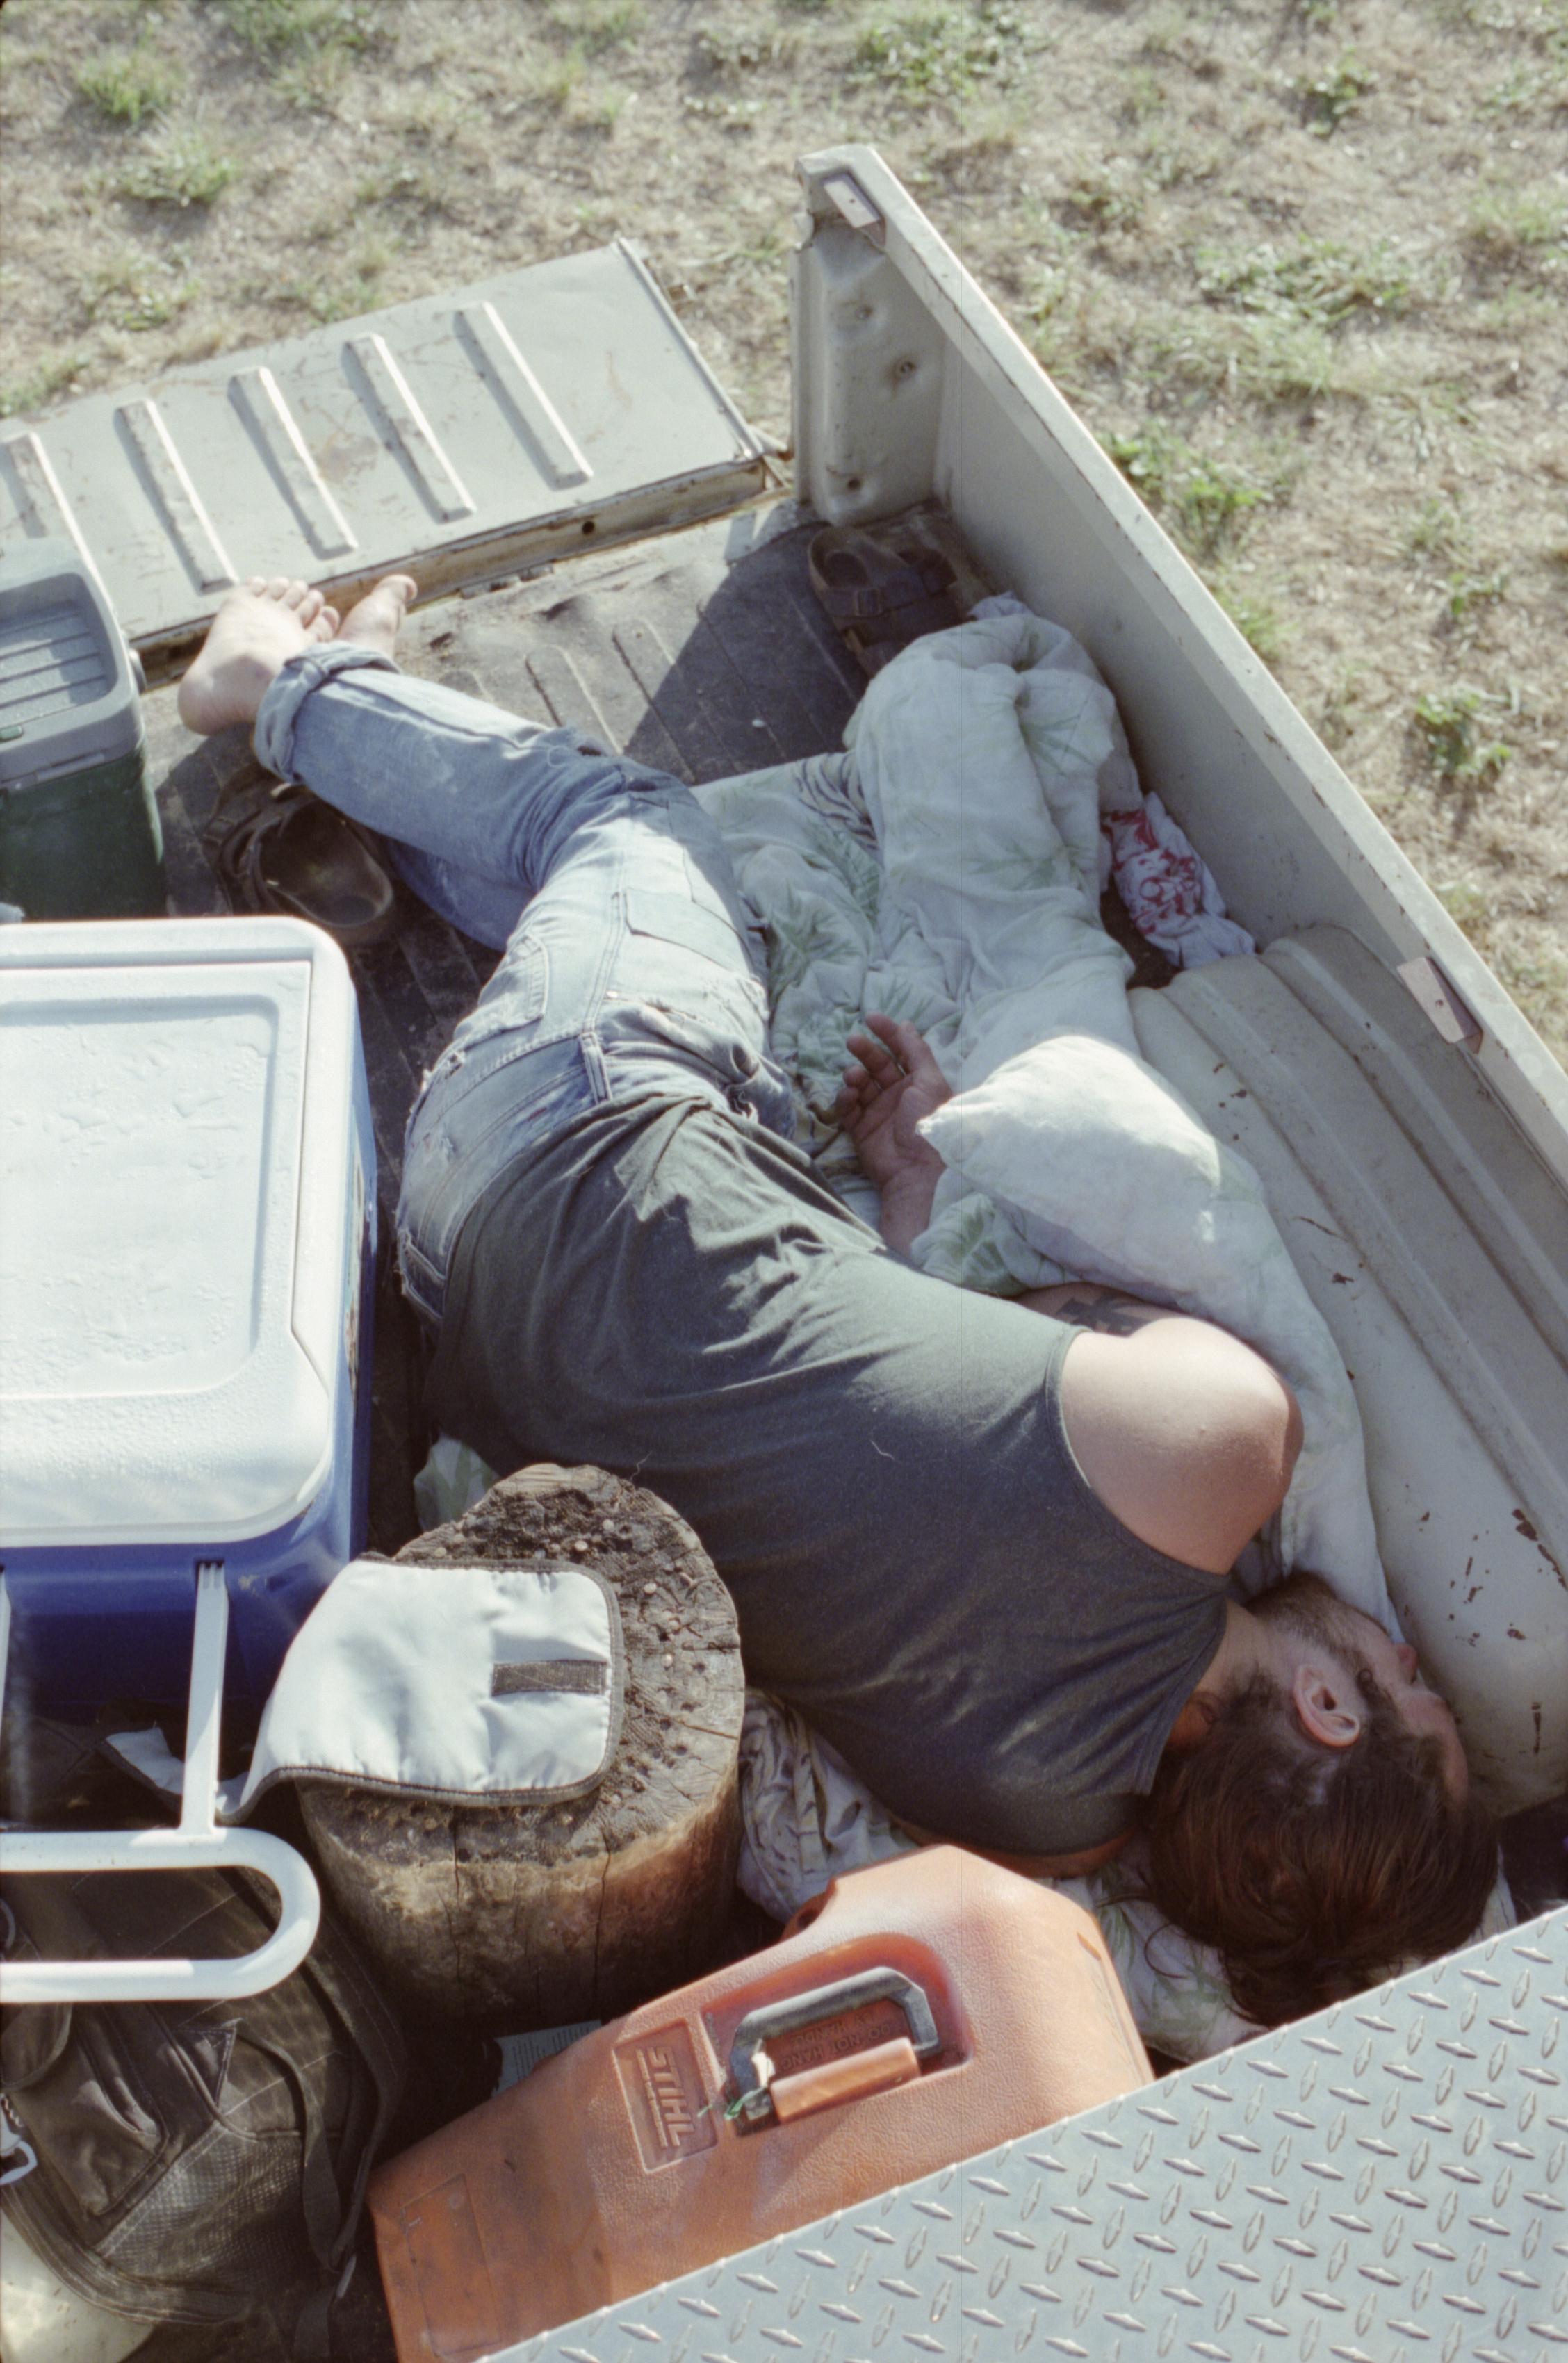 llano texas camping toyota film whatley pawlowski truck